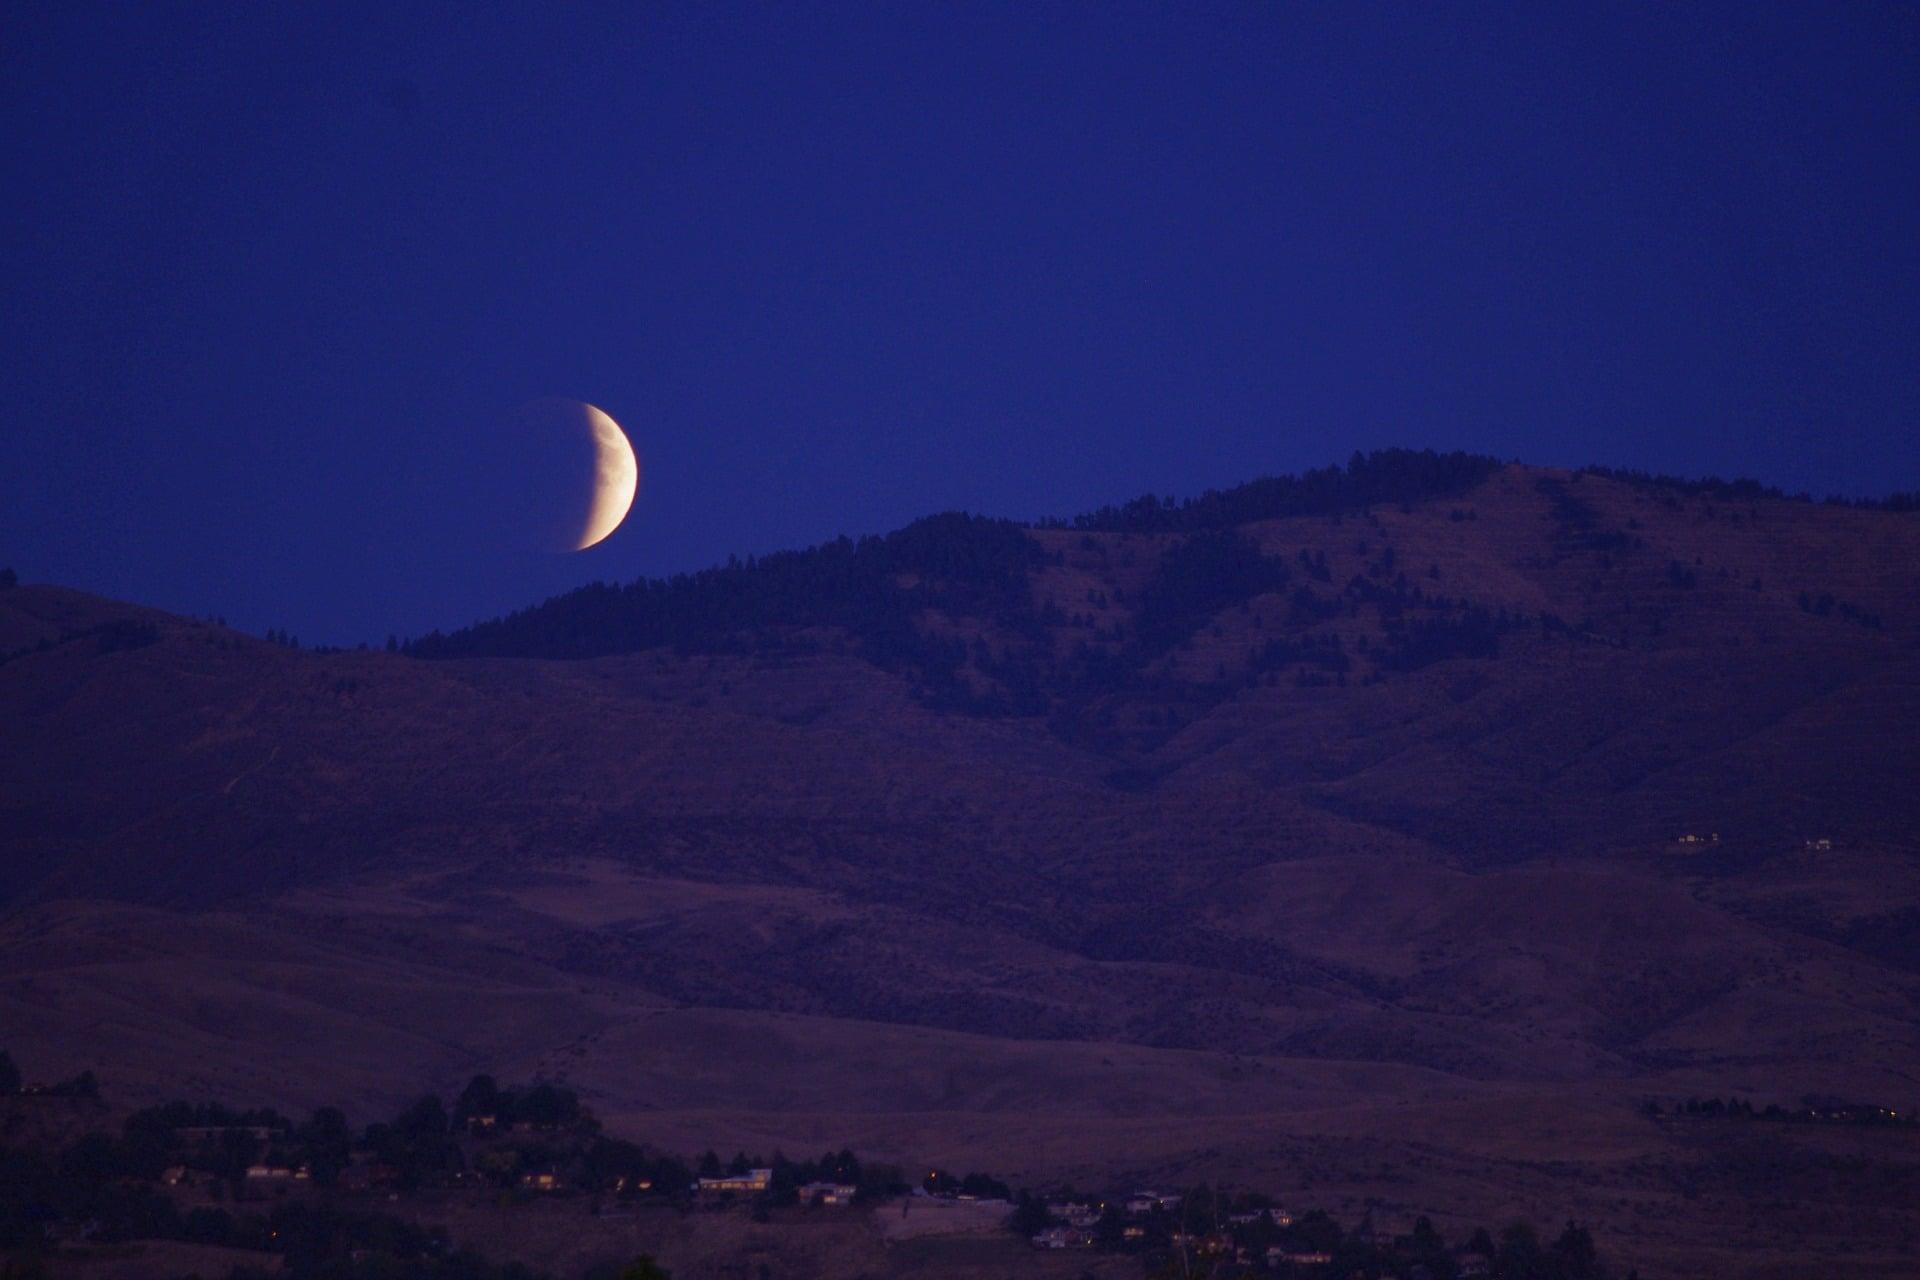 How to Photograph a Lunar Eclipse